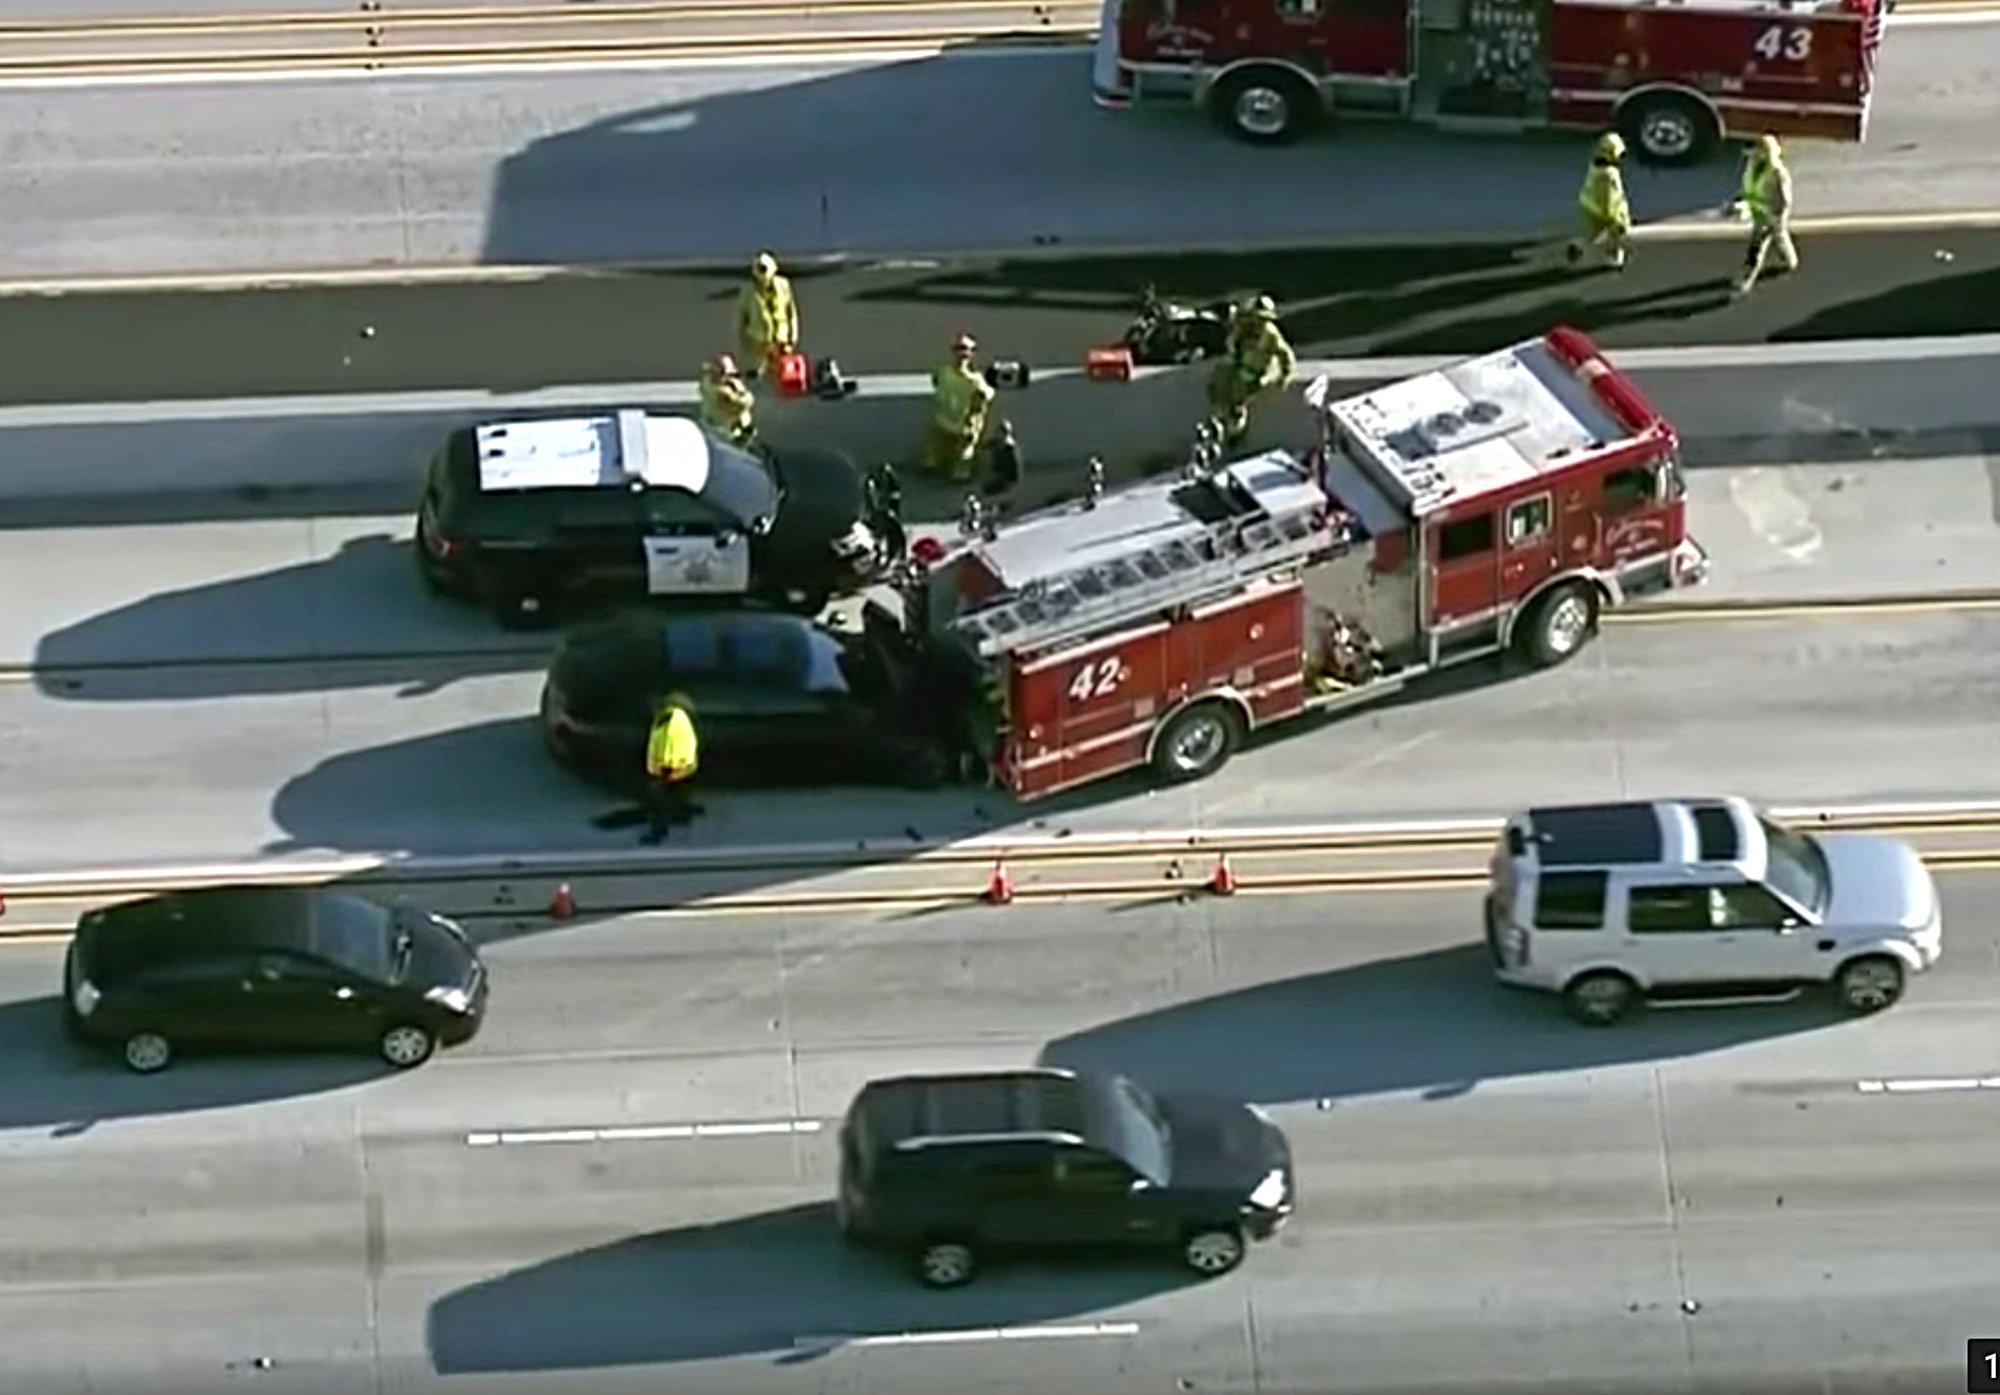 tesla-crash-fire-truck-405-los-angeles.jpg